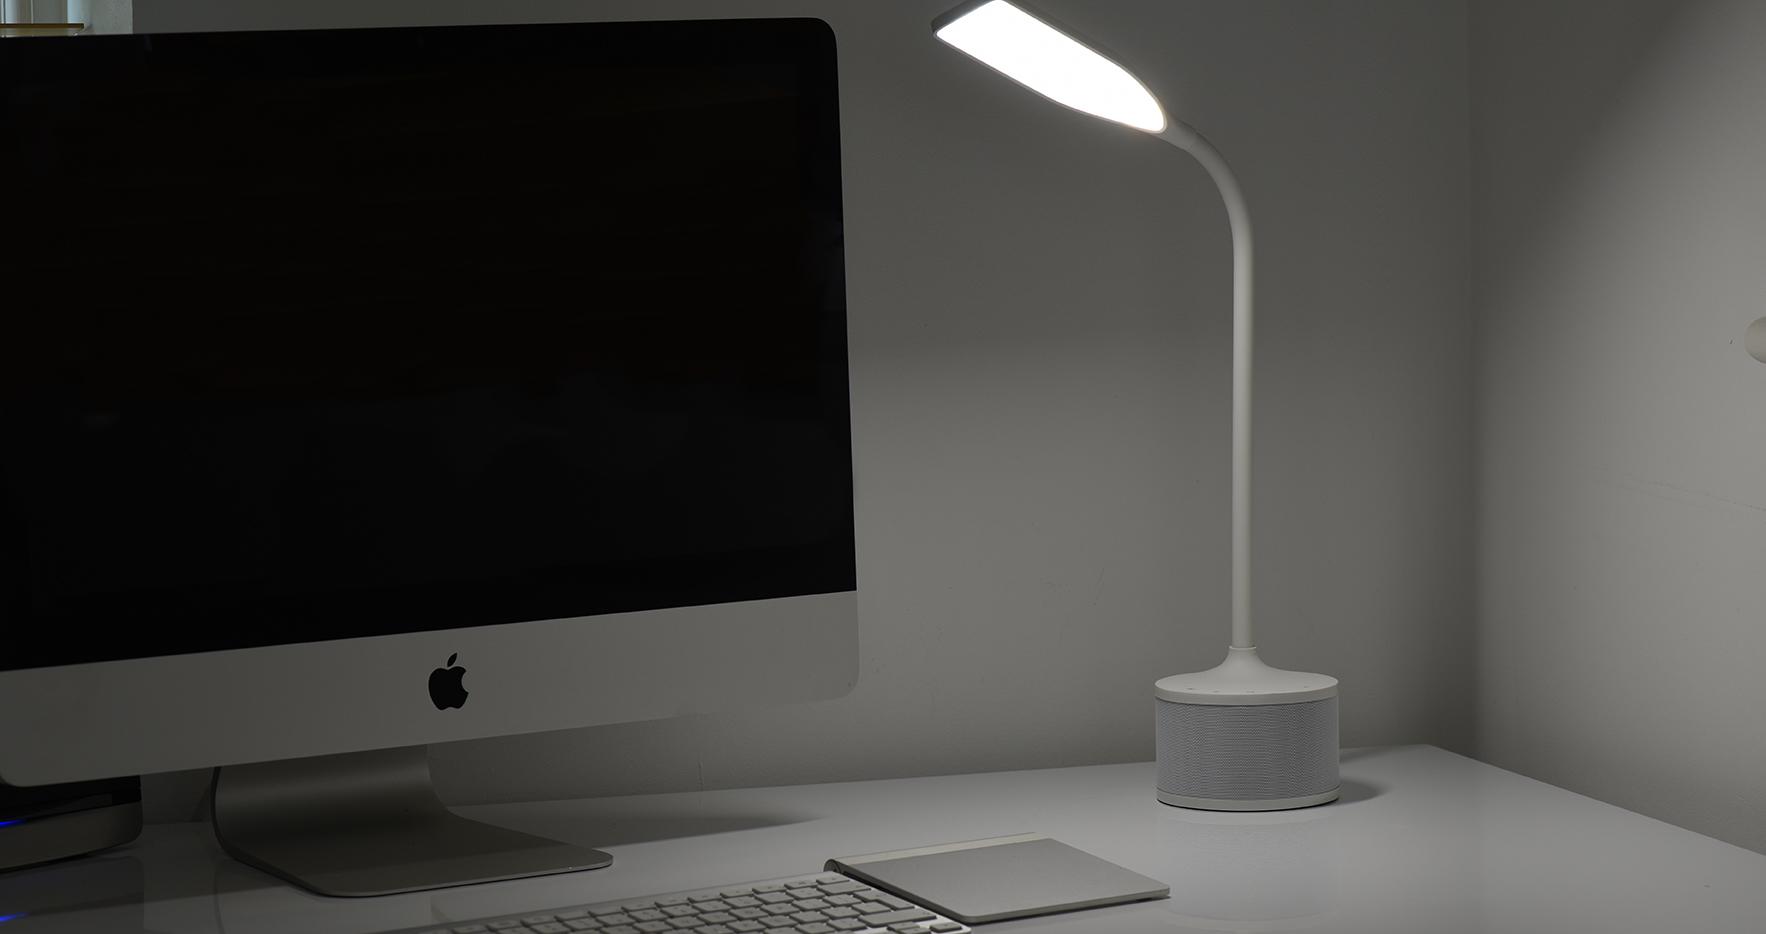 Koble Puls Speaker Desk Lamp Design Essentials